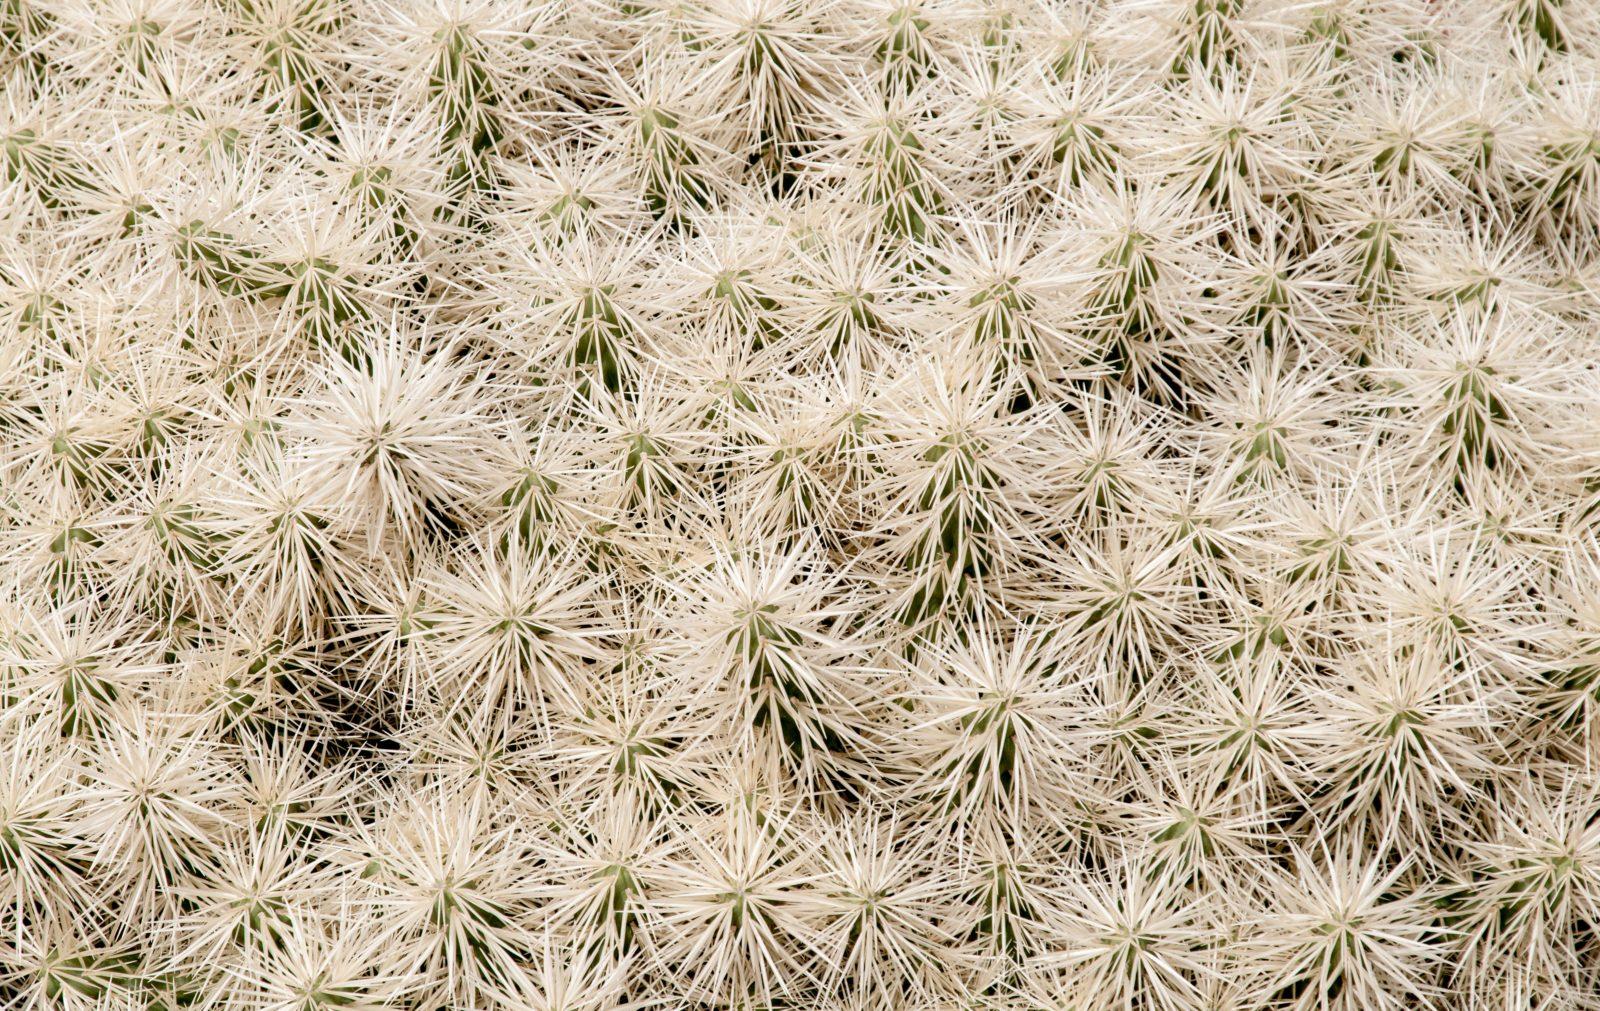 White cactus group background